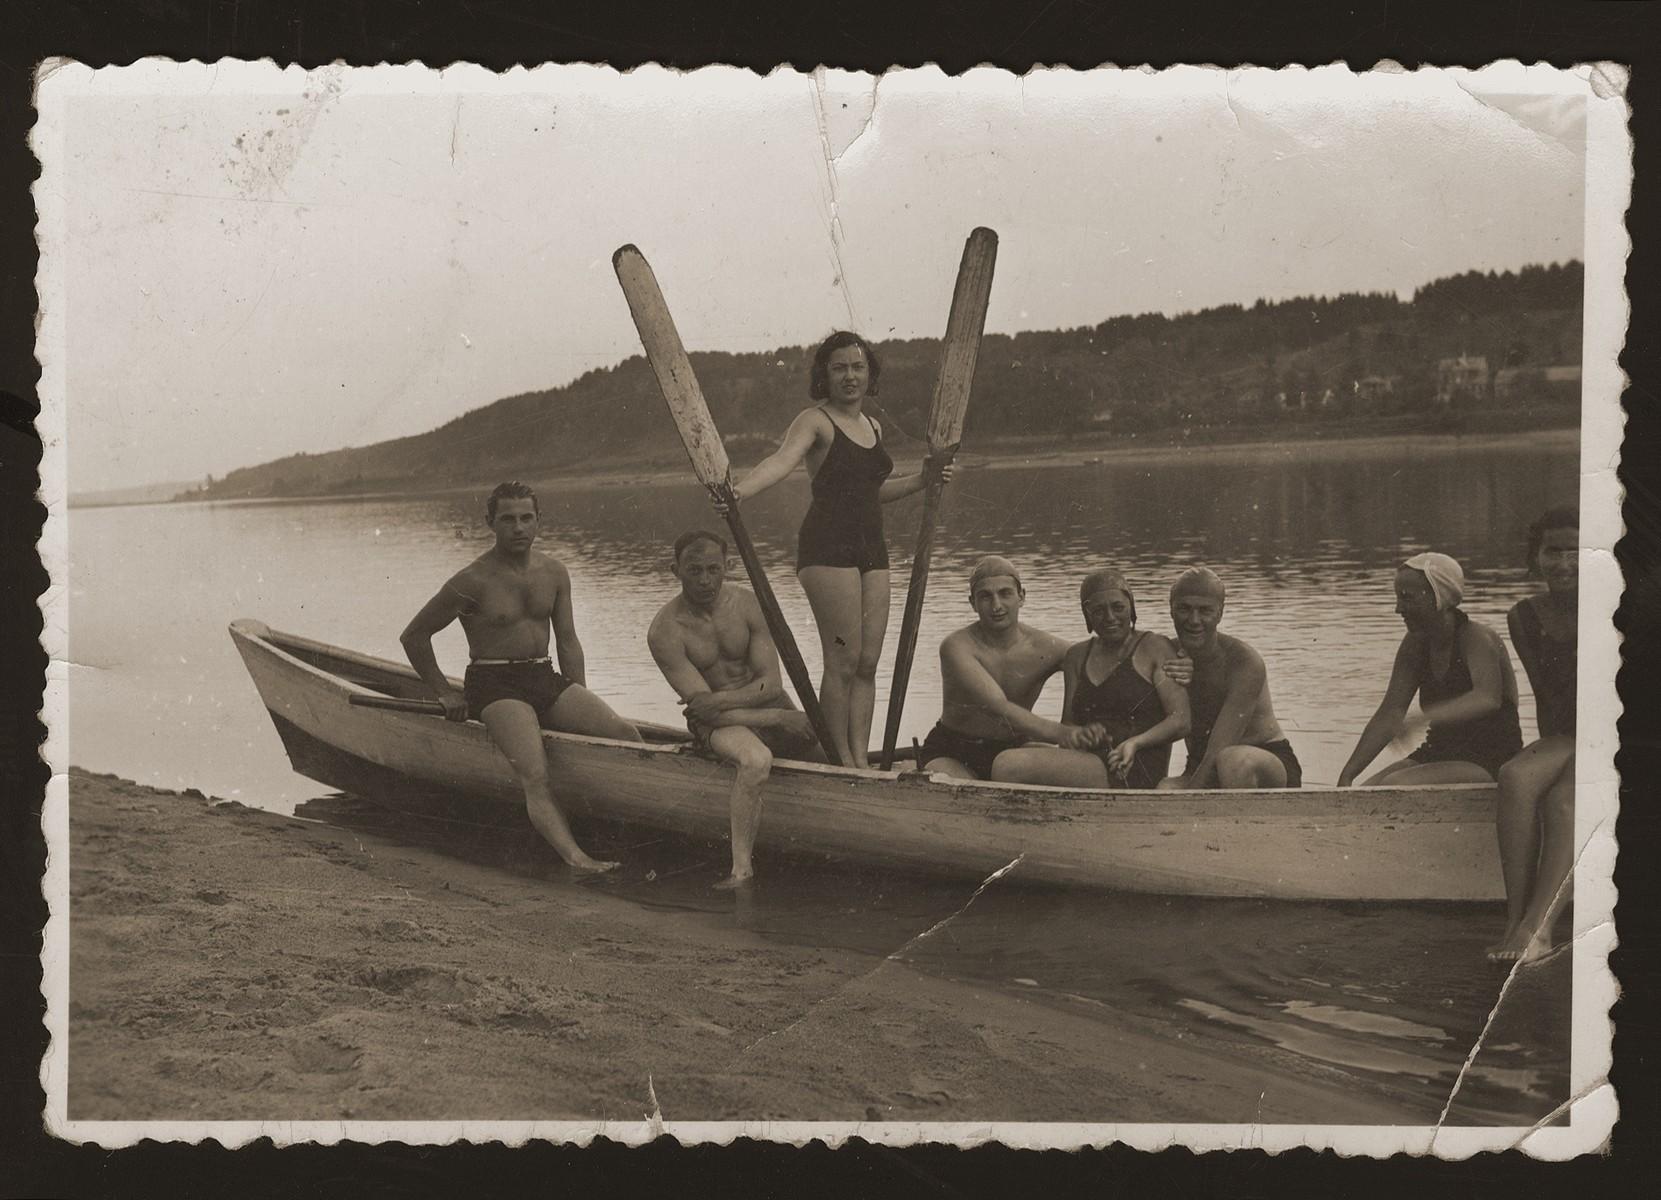 Friends boating on the Nemunas River in the village of Katcherine near Kaunas.    Pictured from left to right are Yehuda Zupovitz, Hirsh Kadushin (George Kadish), Liolia Bermann, unidentified, Riva Levi, Jasha Langleben, Polia Cukermann, and Dita Katz.